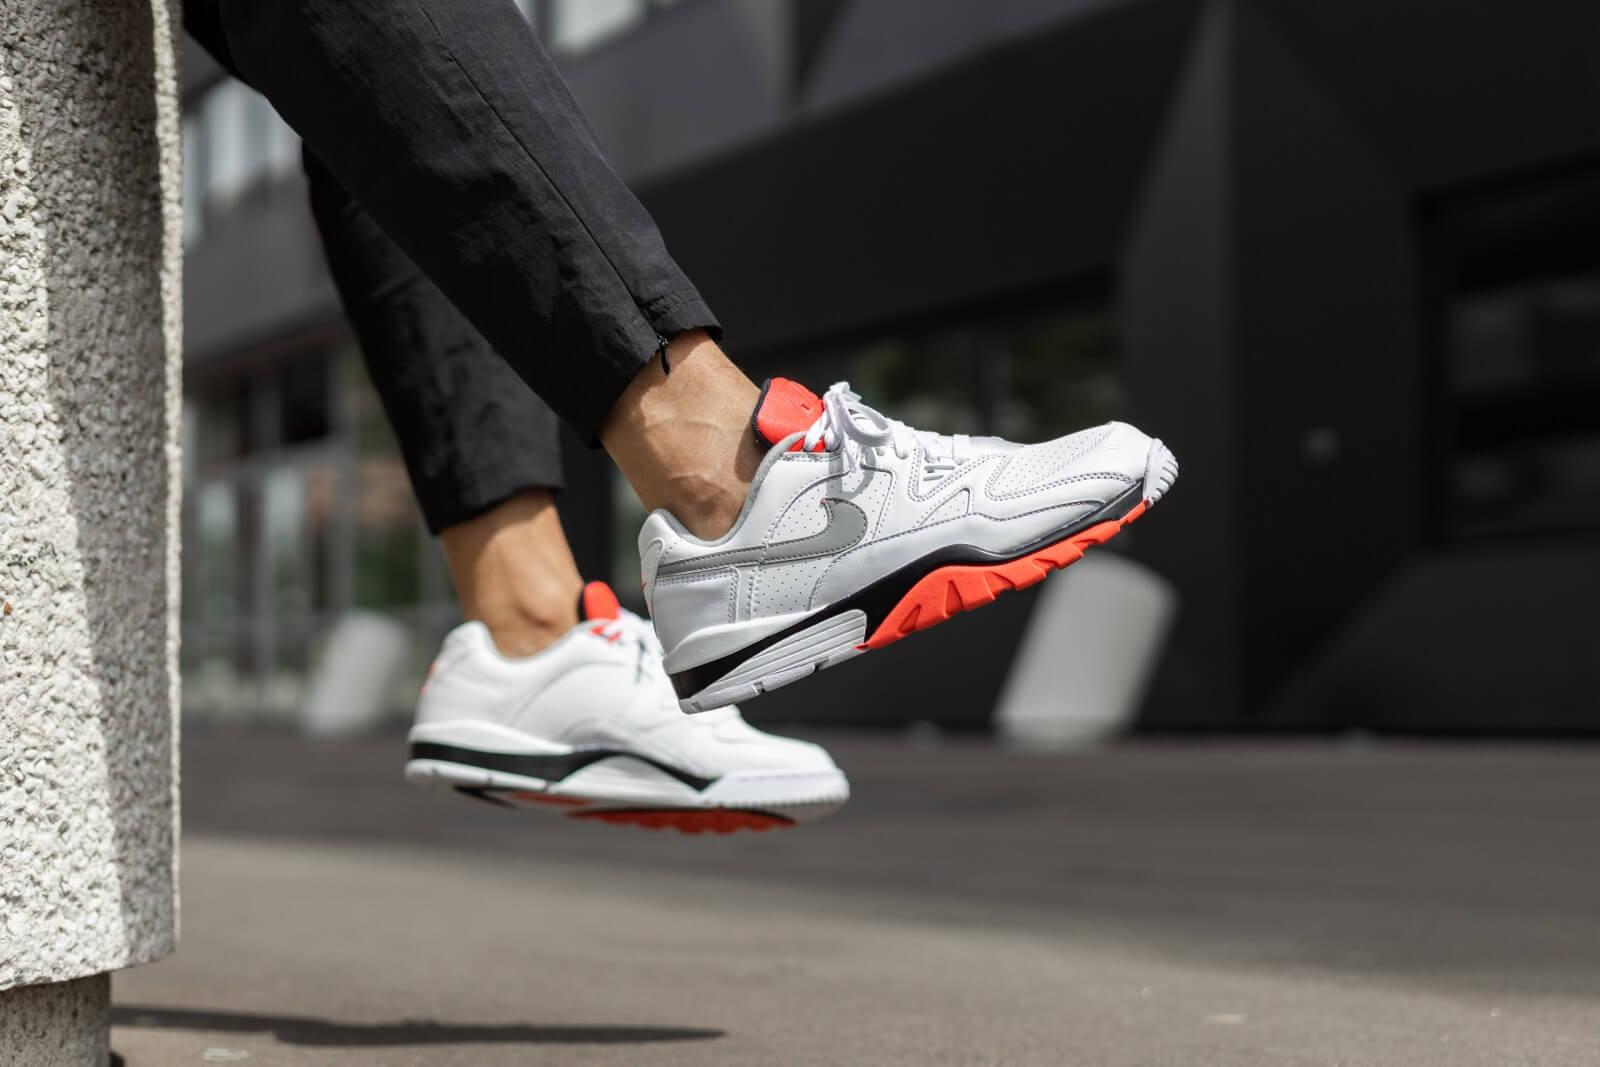 Nike Air Cross Trainer 3 Low White/LT